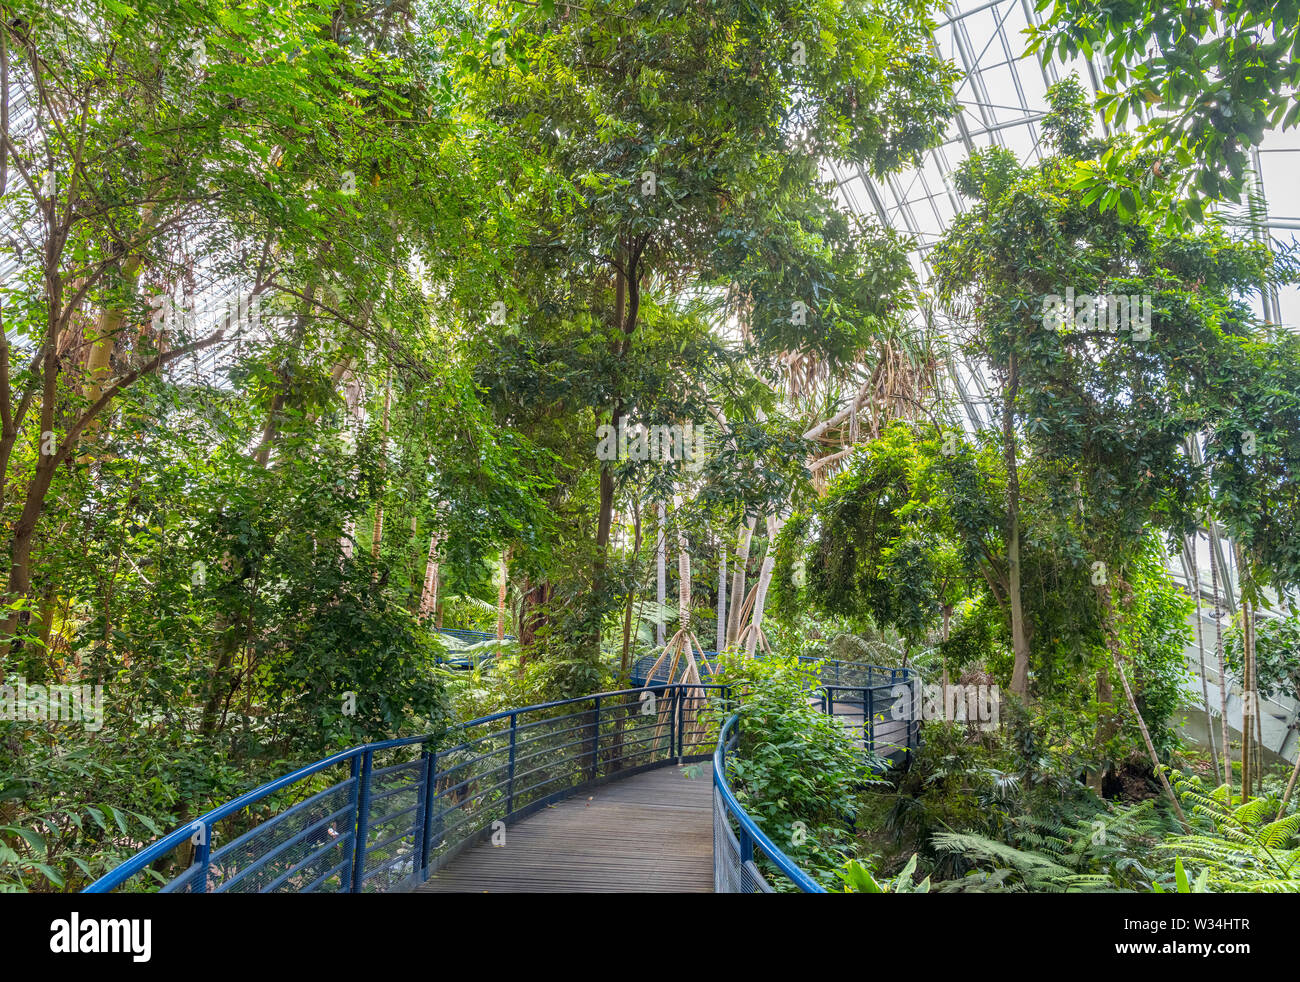 Innenraum der Bicentennial Conservatory, Adelaide Botanic Garden, Adelaide, South Australia, Australien Stockfoto